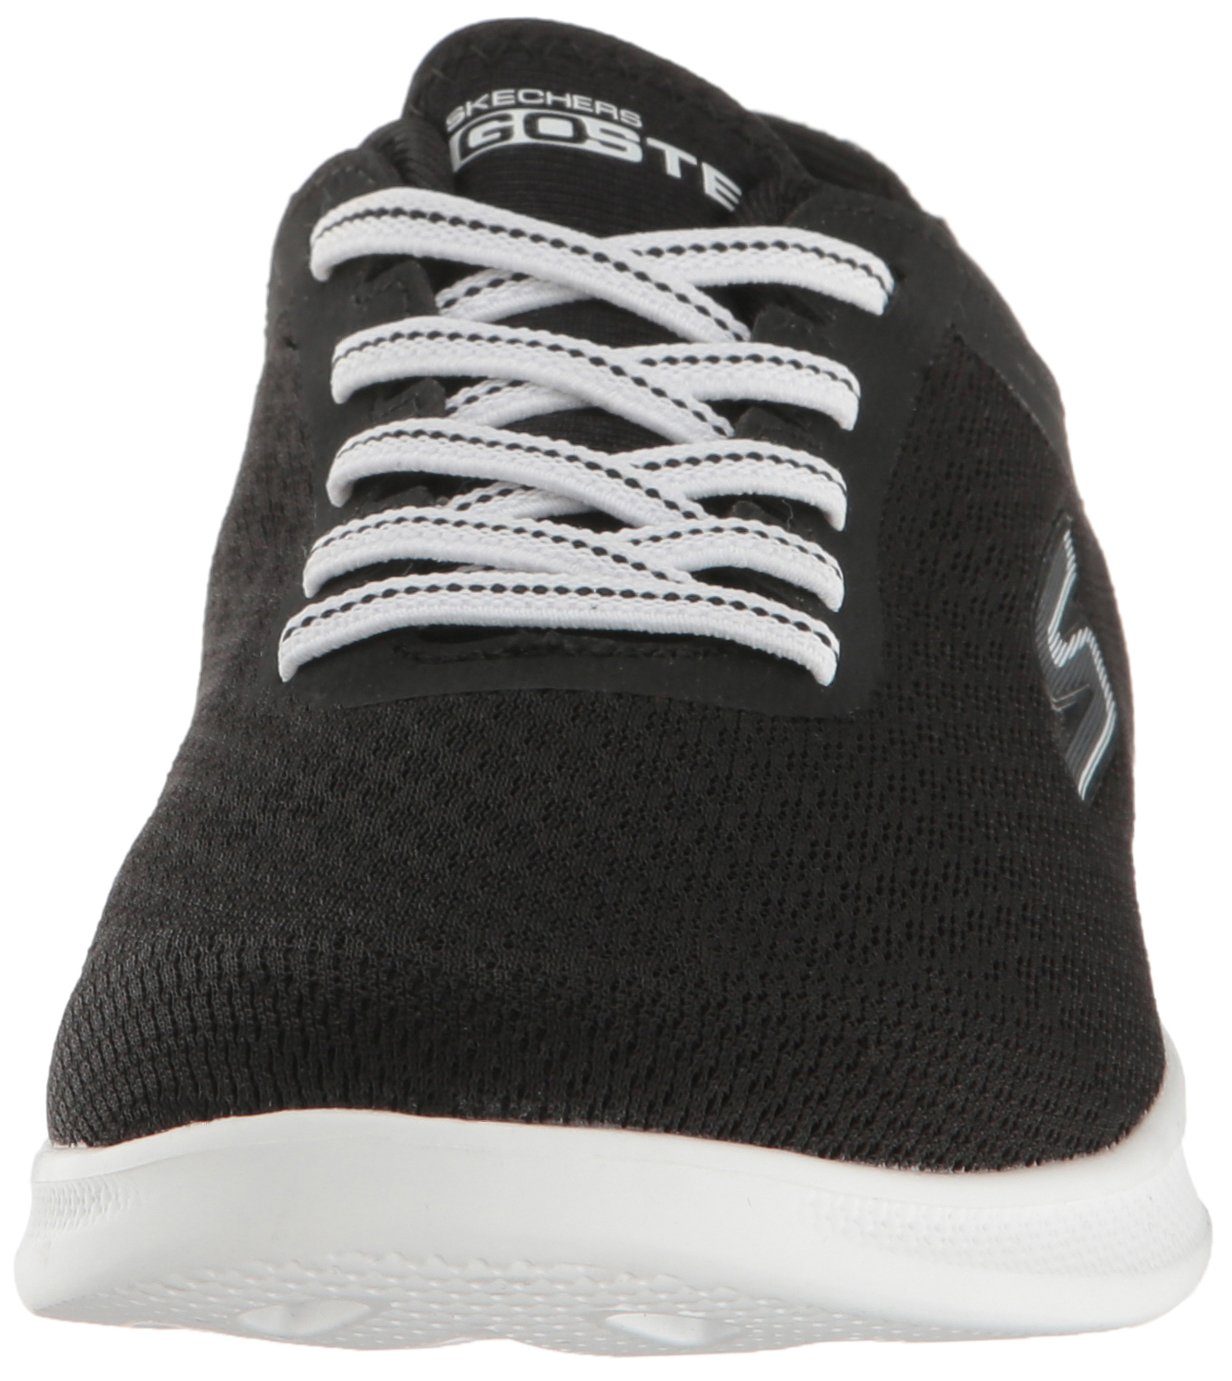 Skechers Lite-Agile Performance síťka Dámská Go bílá Step Lite-Agile chůze  Černá  bílá síťka 6990cc3 303400db51